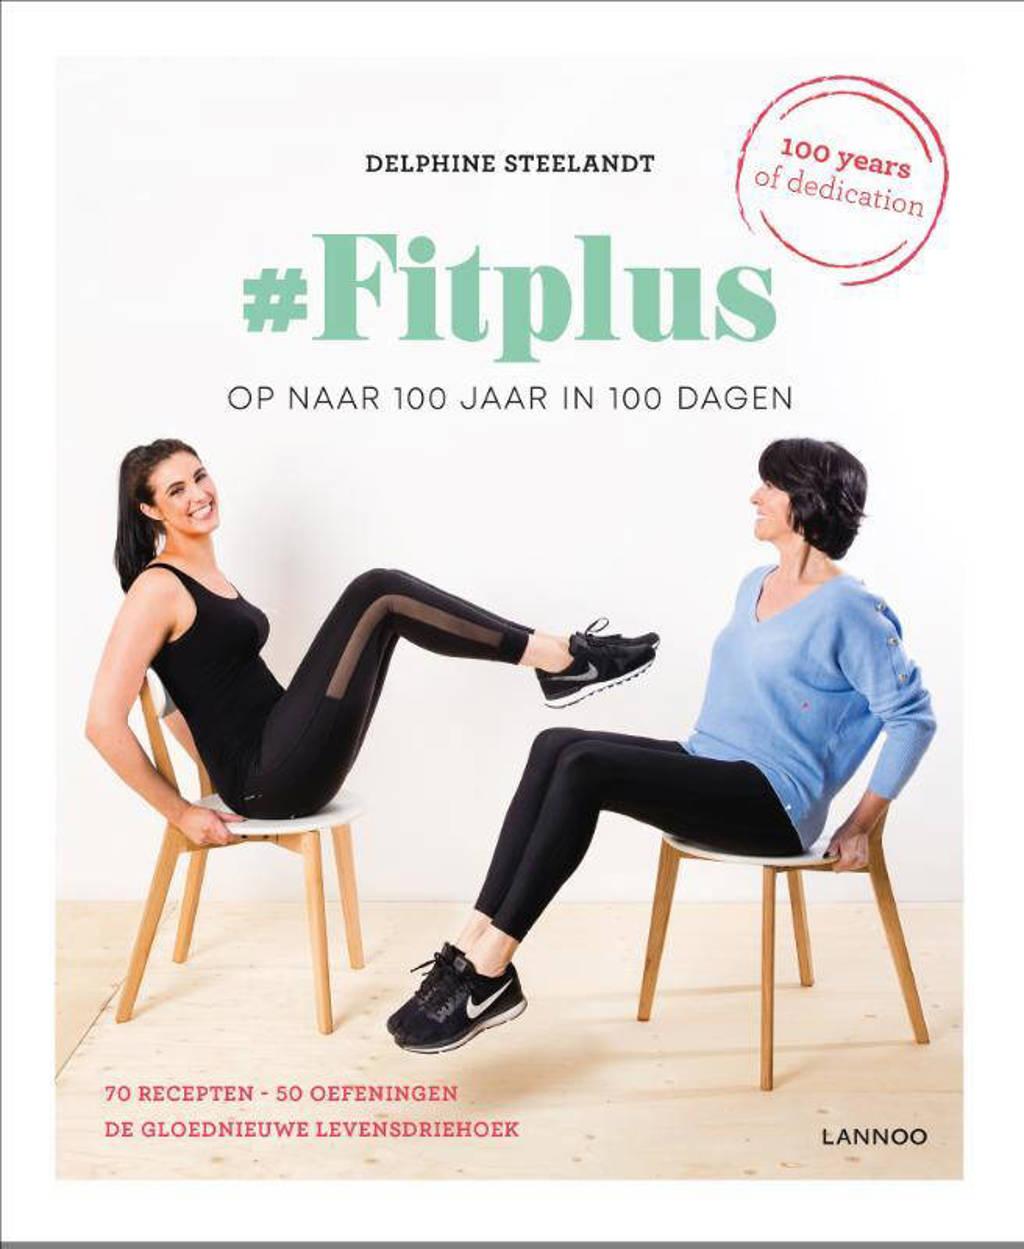 #FitPlus - Delphine Steelandt